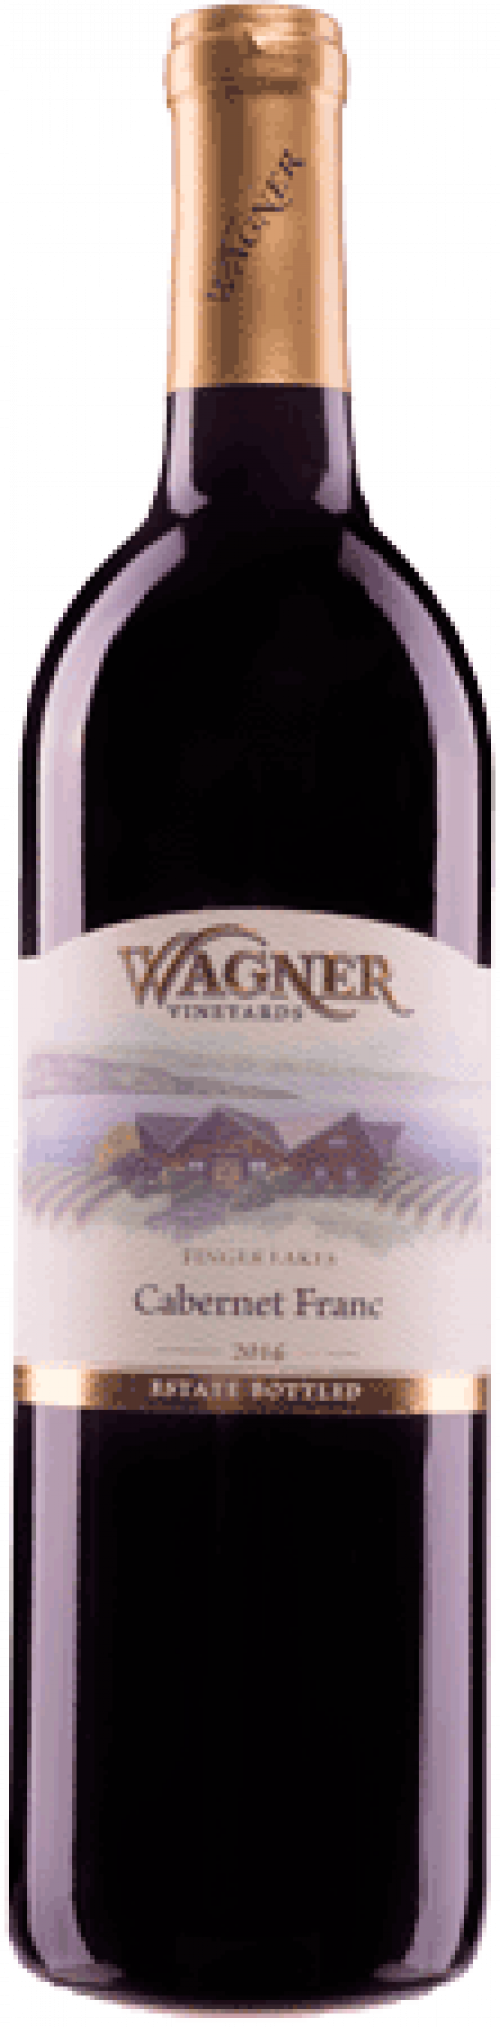 2019 Wagner Cabernet Franc 750ml